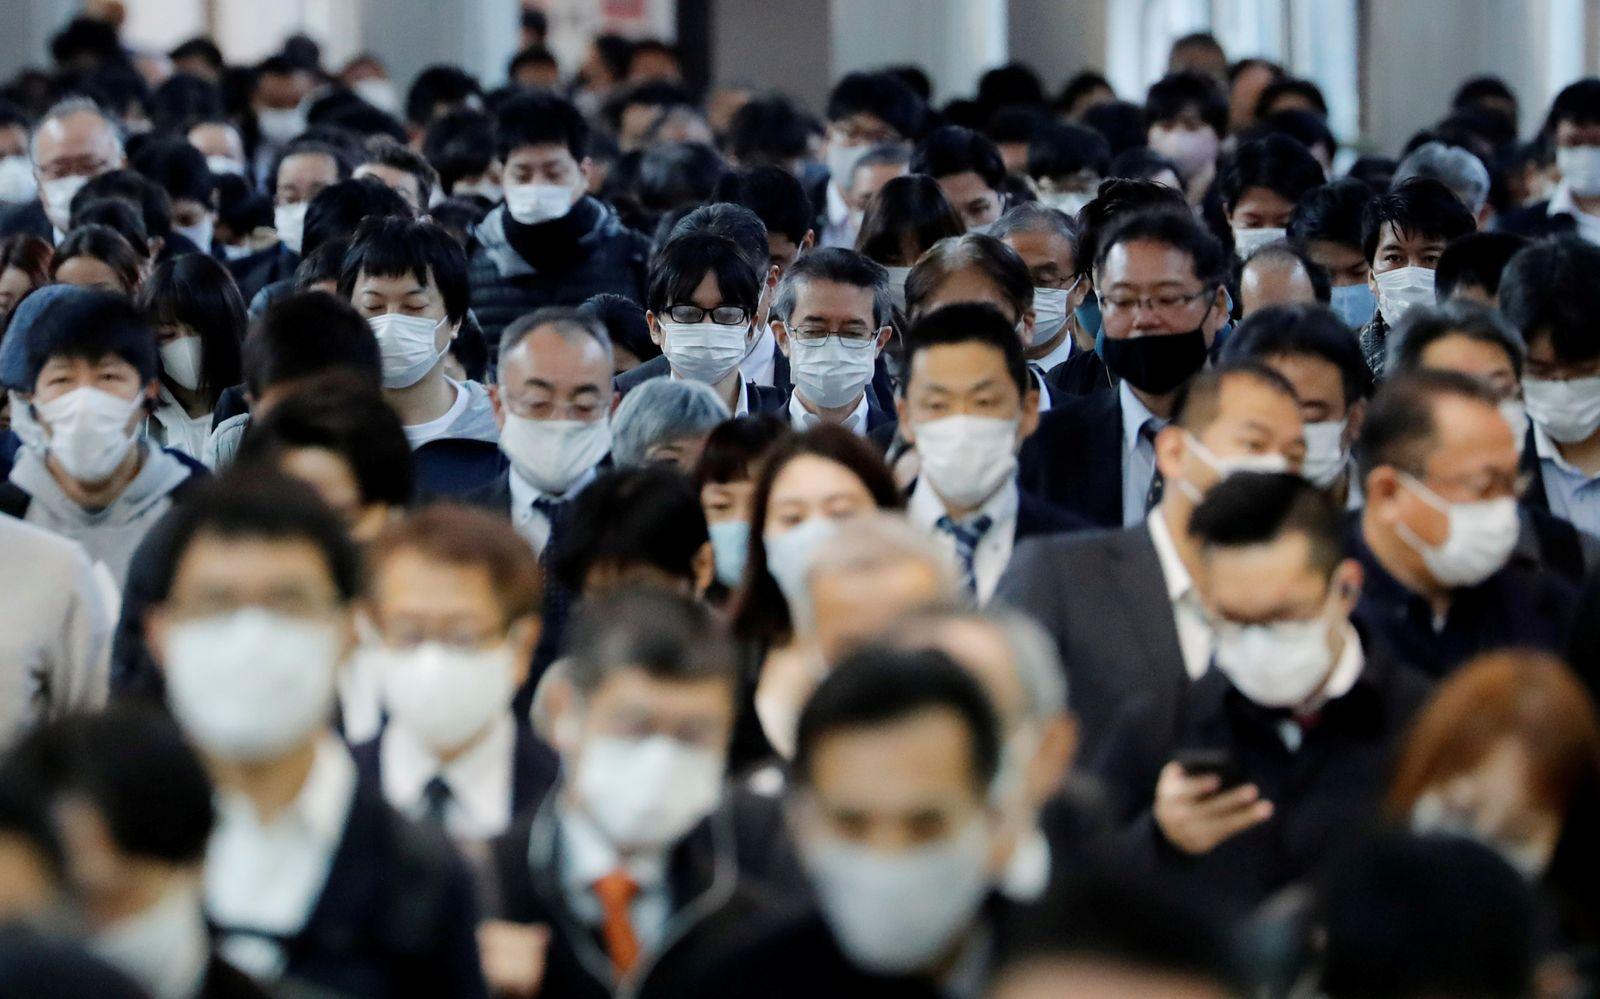 FILE PHOTO: Outbreak of the coronavirus disease (COVID-19) in Tokyo, Japan